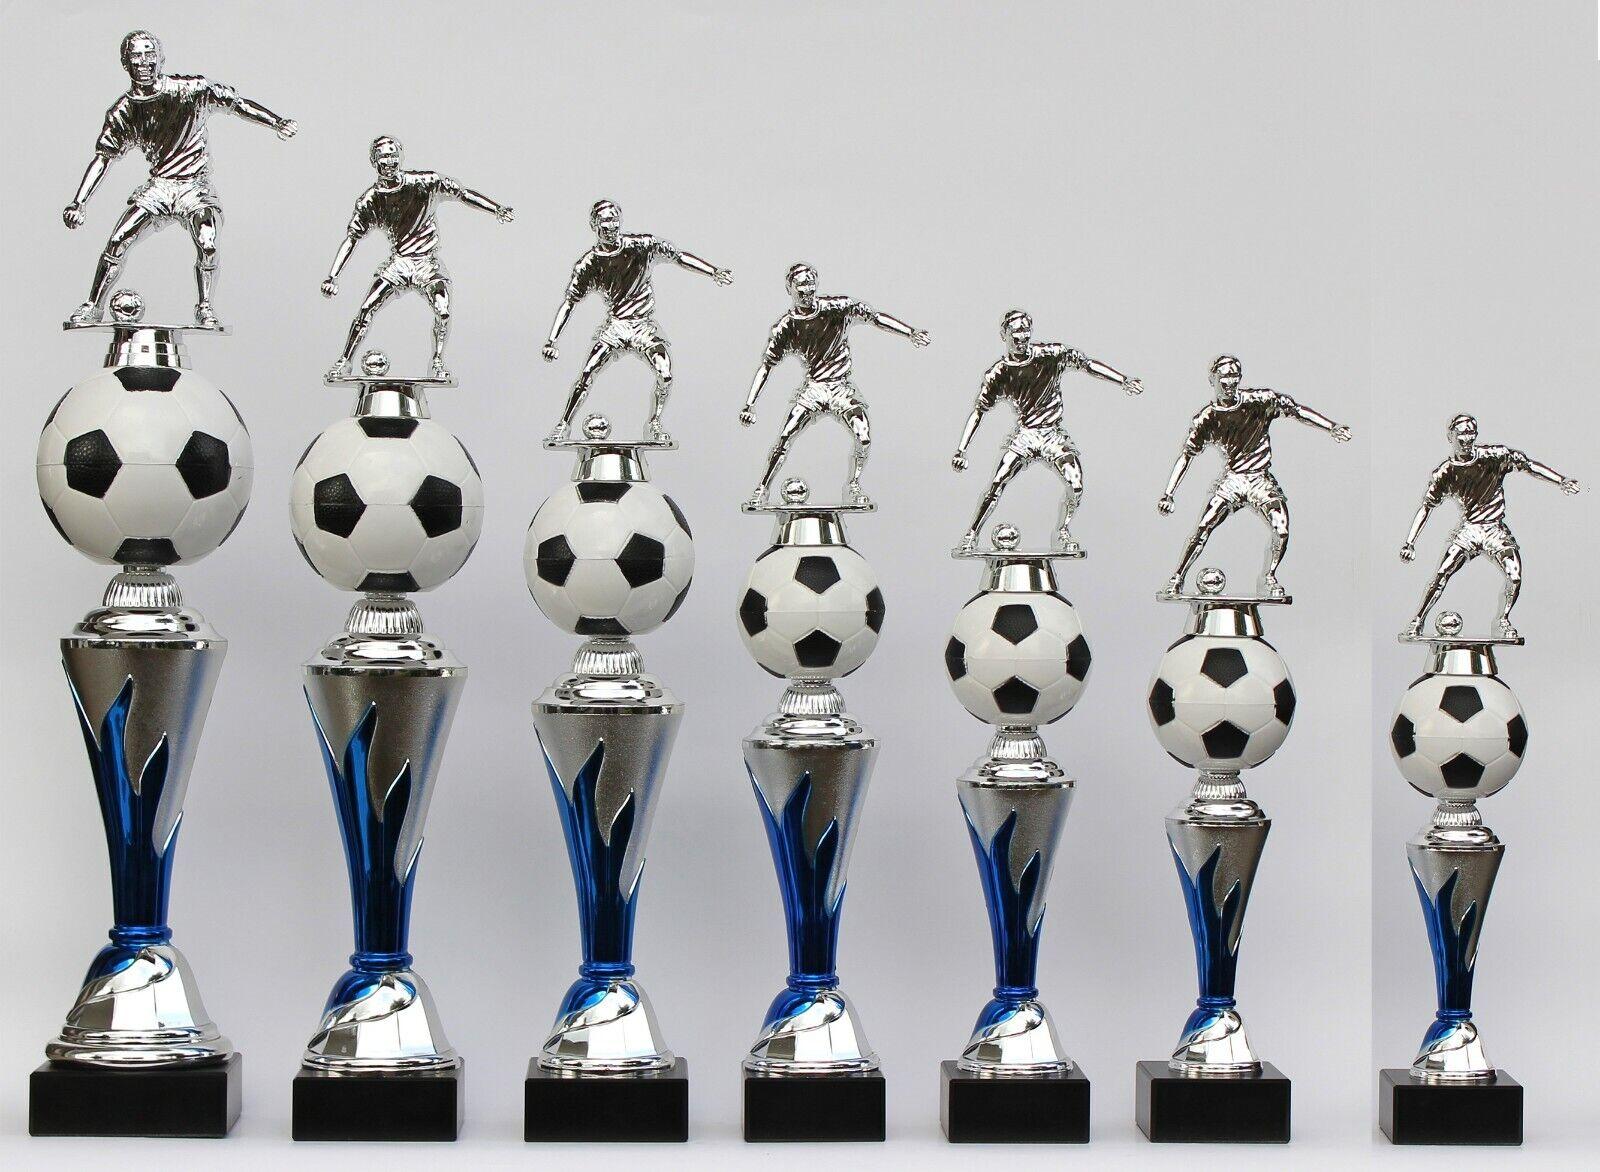 7er-serie trofeo trofeos fútbol figuras también con damas  on fire  incl. gravures